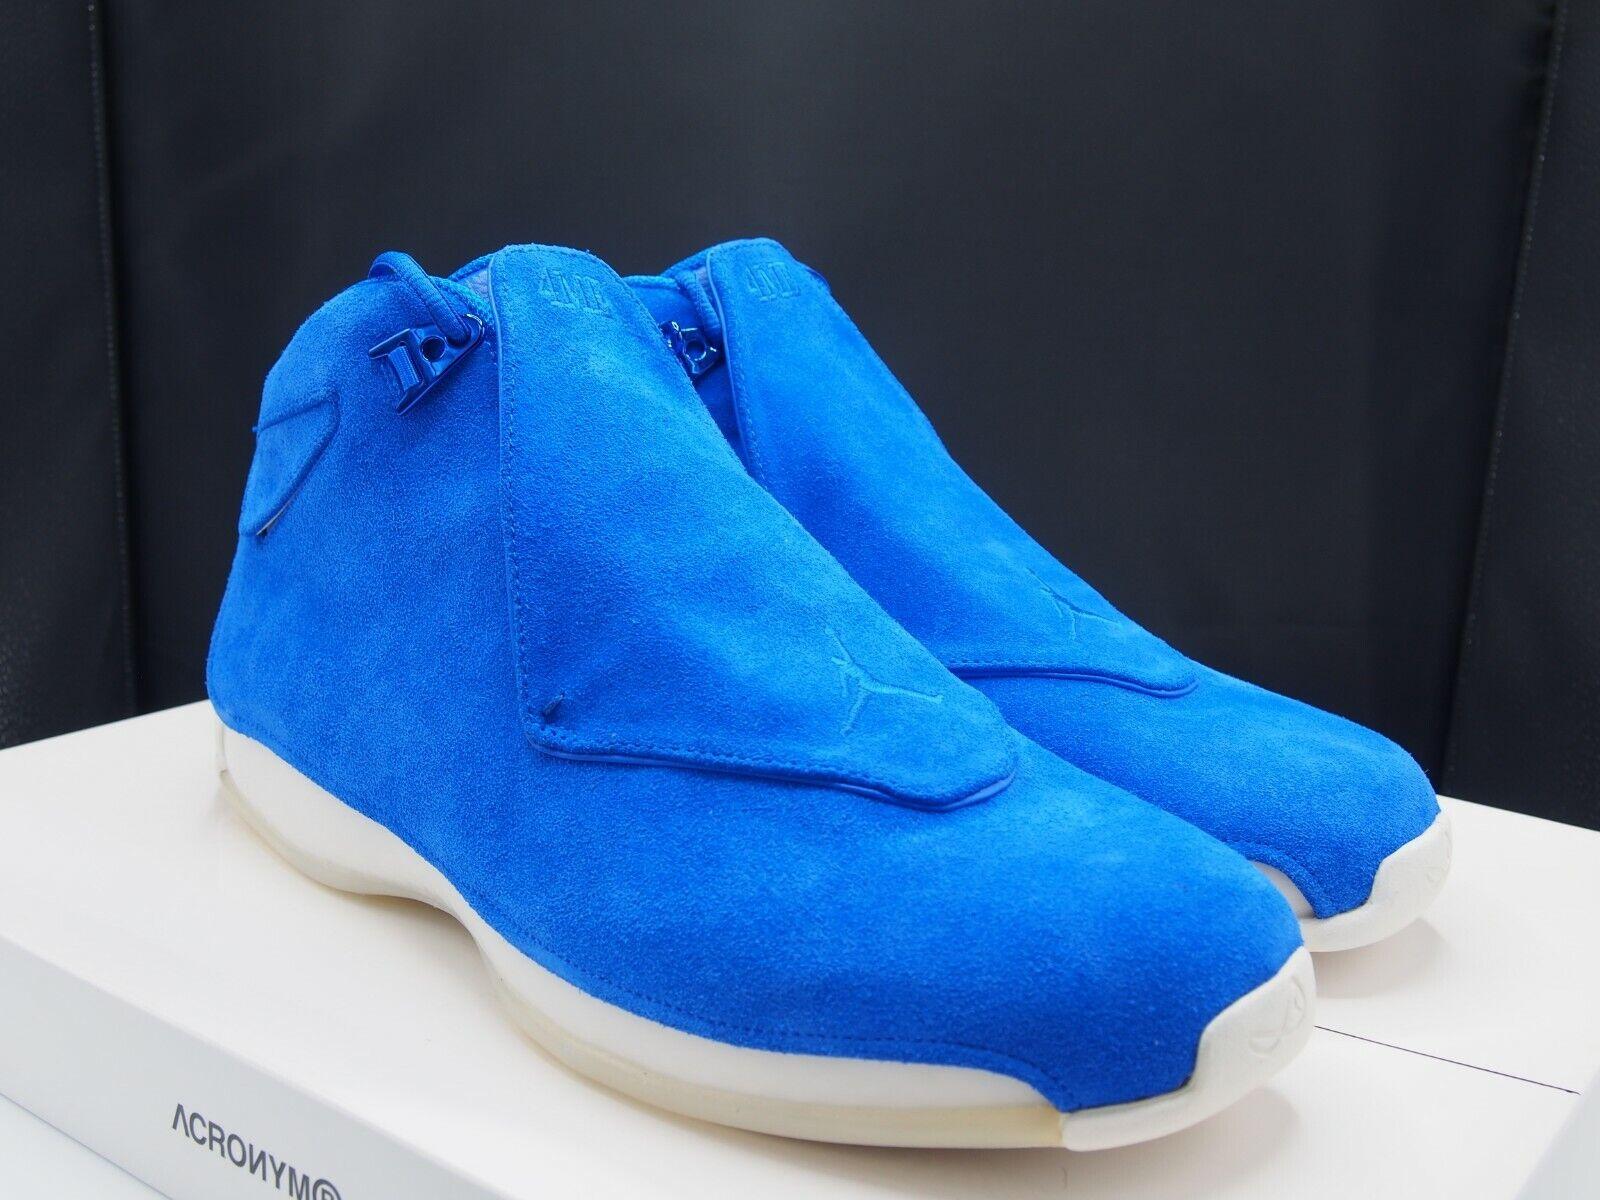 275ce770e6cc Nike Air Jordan 18 Retro Racer bluee AA2494-401 Men s size size size 14 US